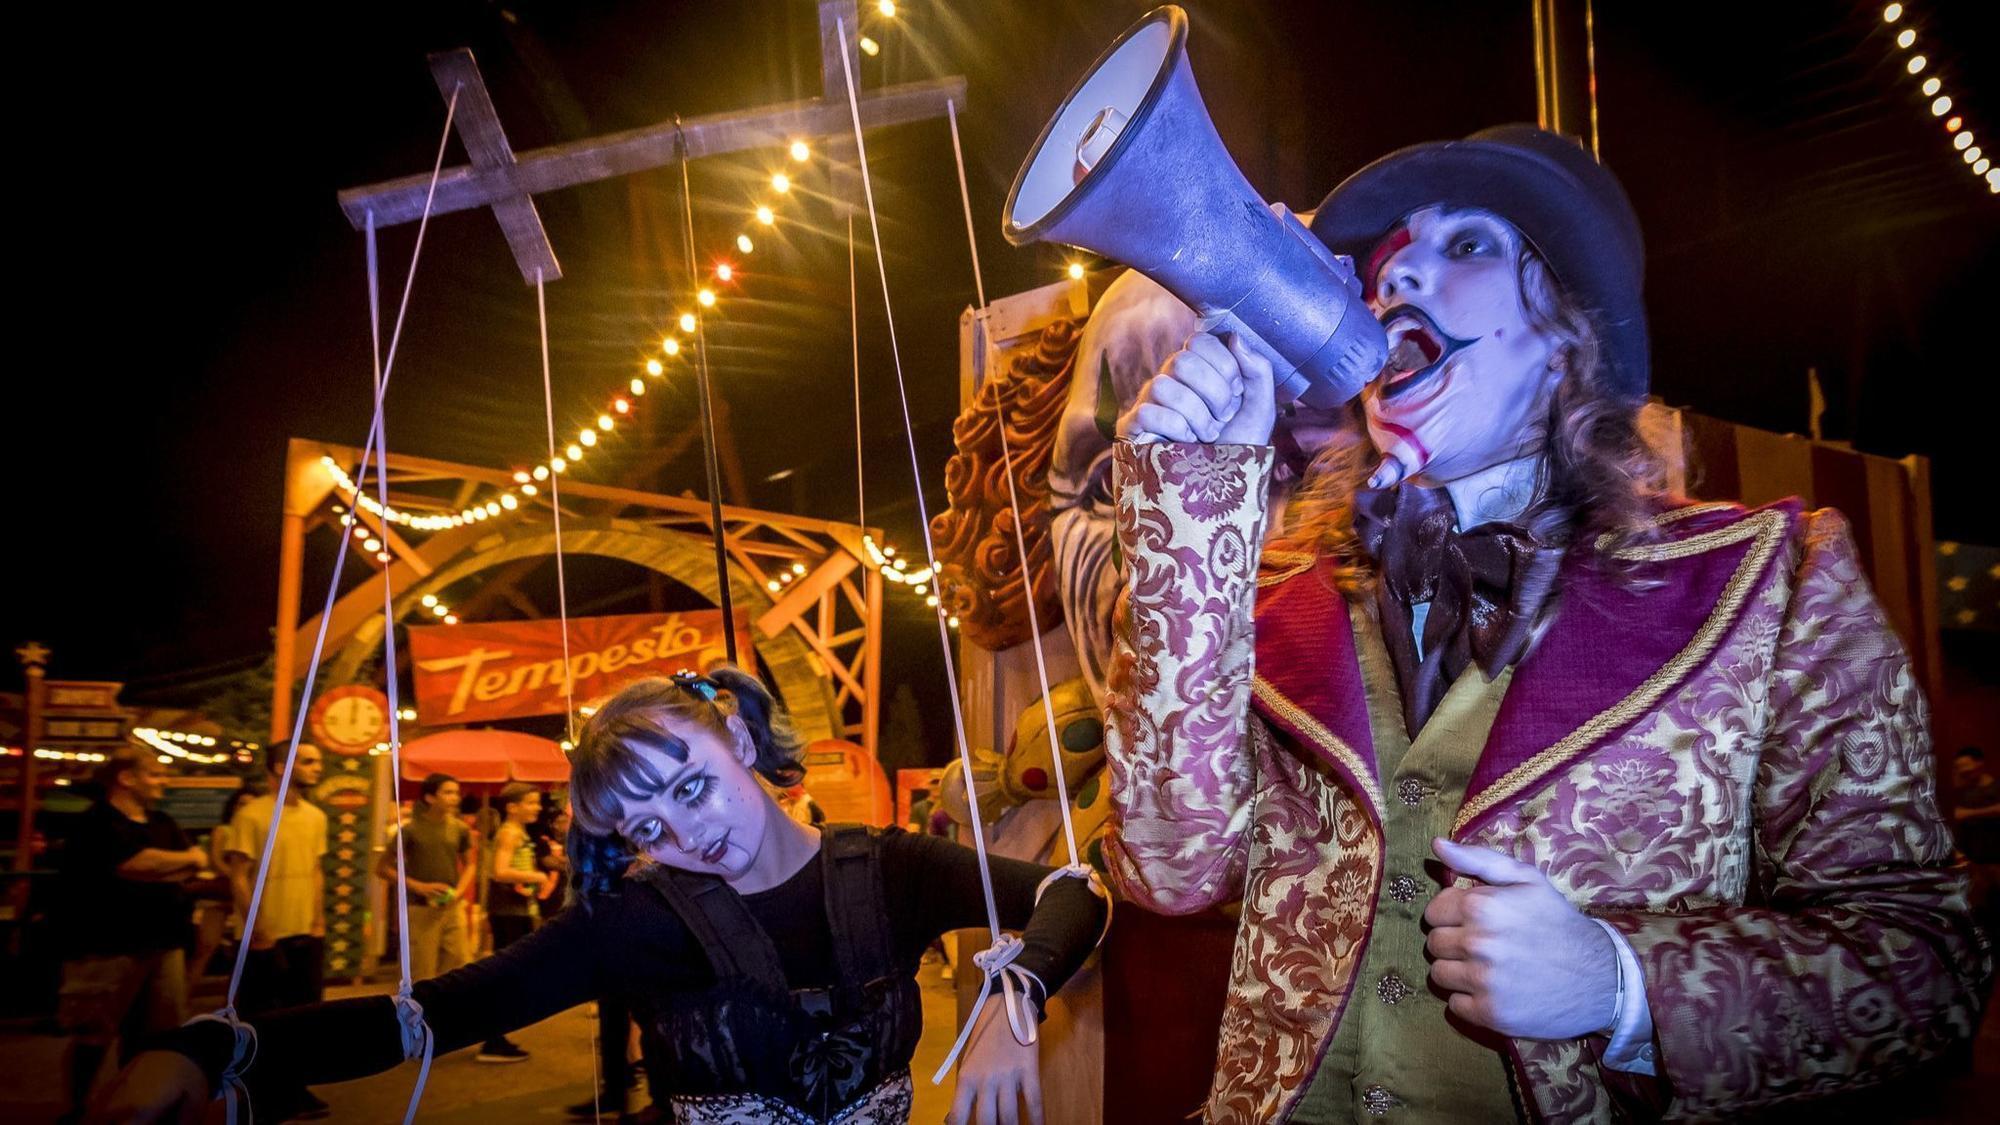 Busch Gardens celebrates 20 years of screams - Daily Press